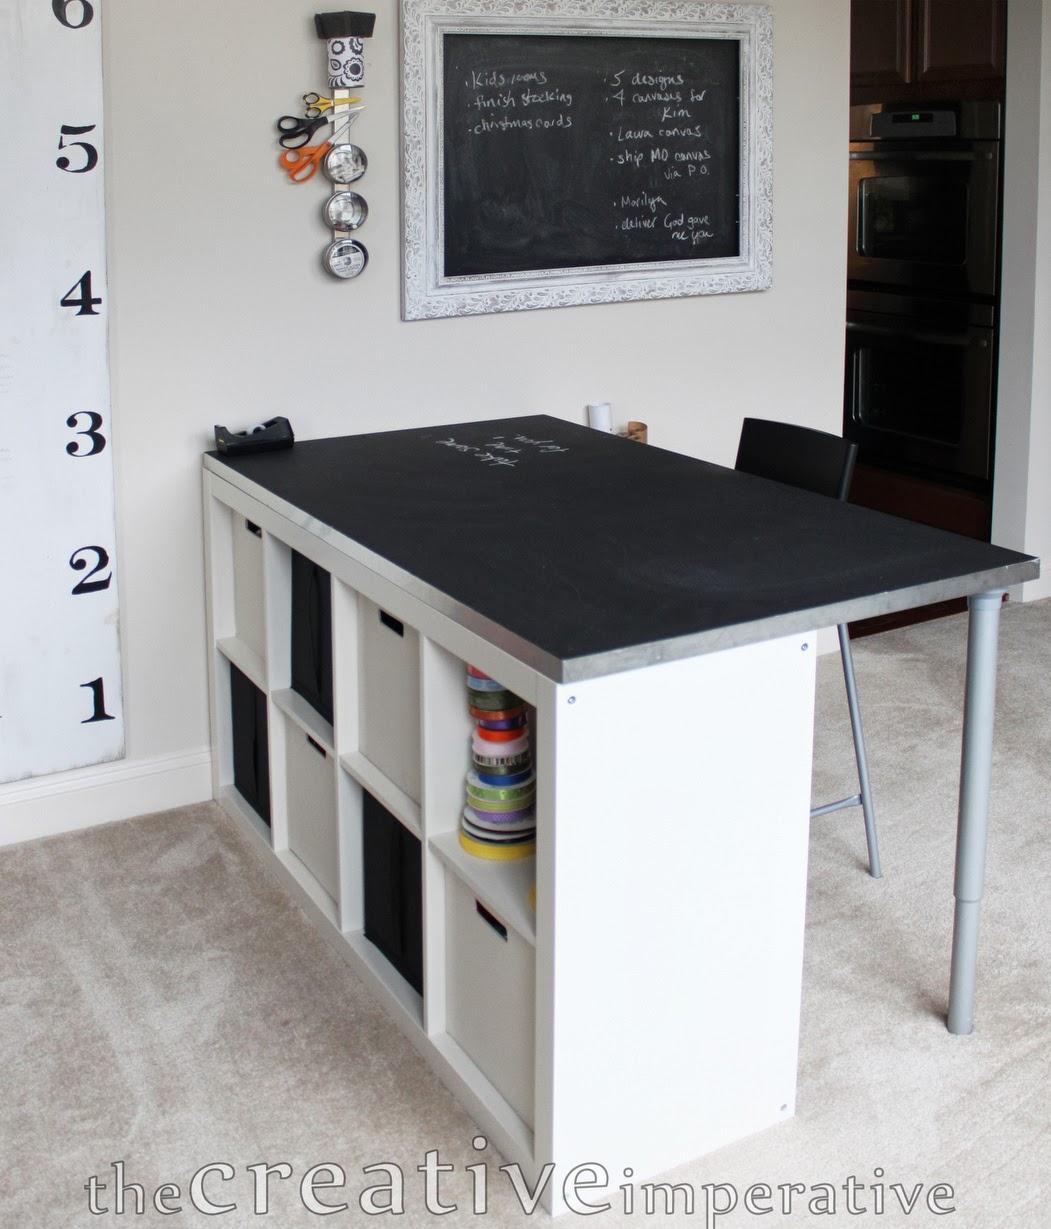 Ikea catalogo tavoli da giardino : ikea bagno e lavanderia. ikea ...